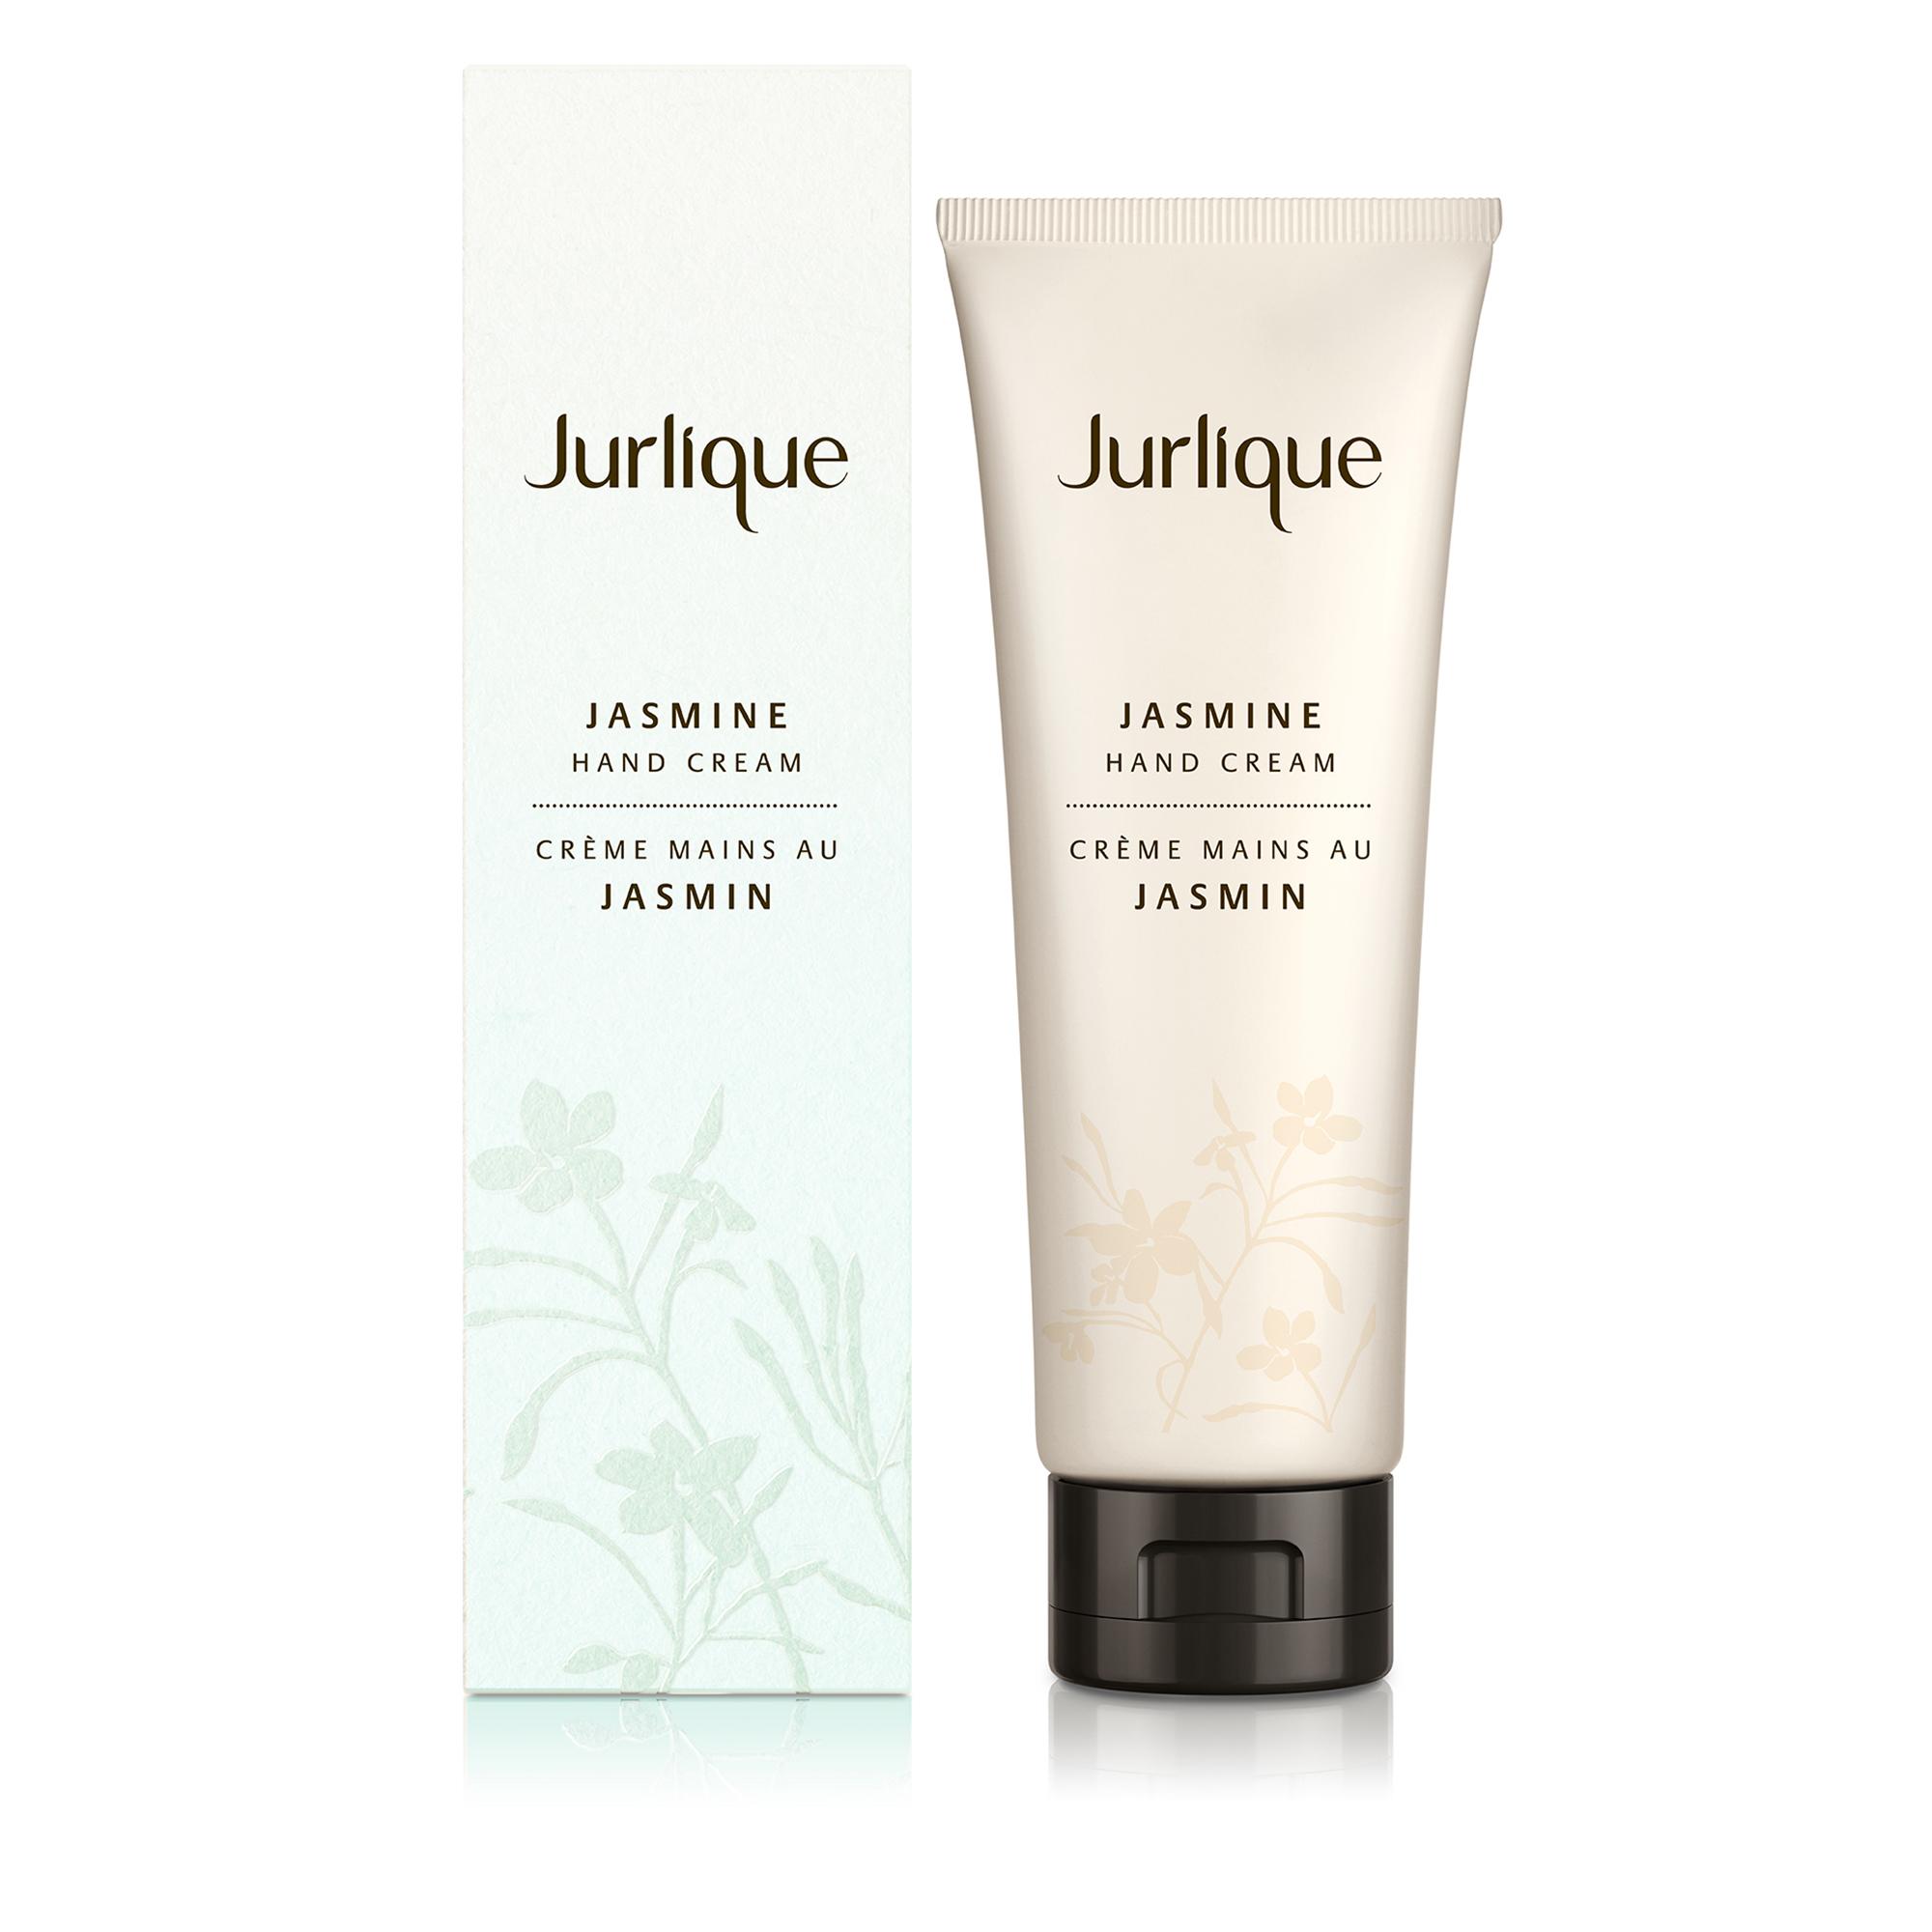 Jurlique Jasmine Hand Cream, 125 ml